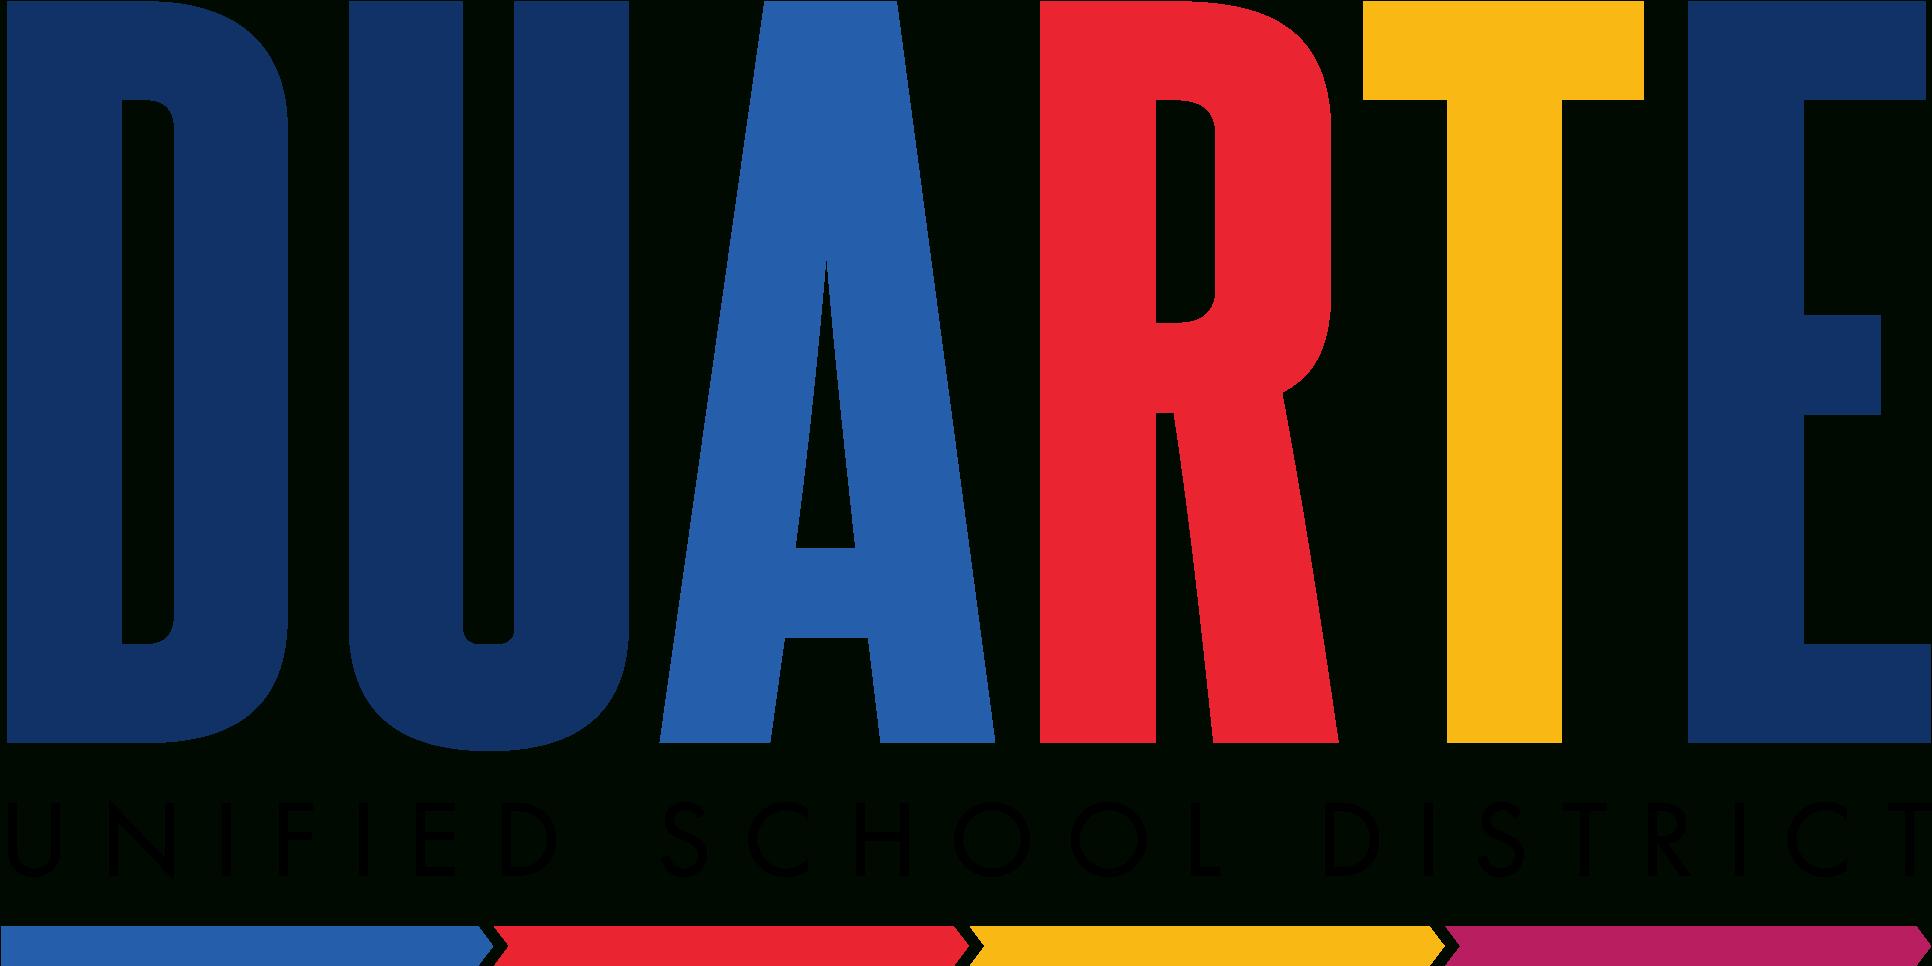 Duarte Unified School District – Duarte Unified School Logo Intended For Kenosha United School District Calendar